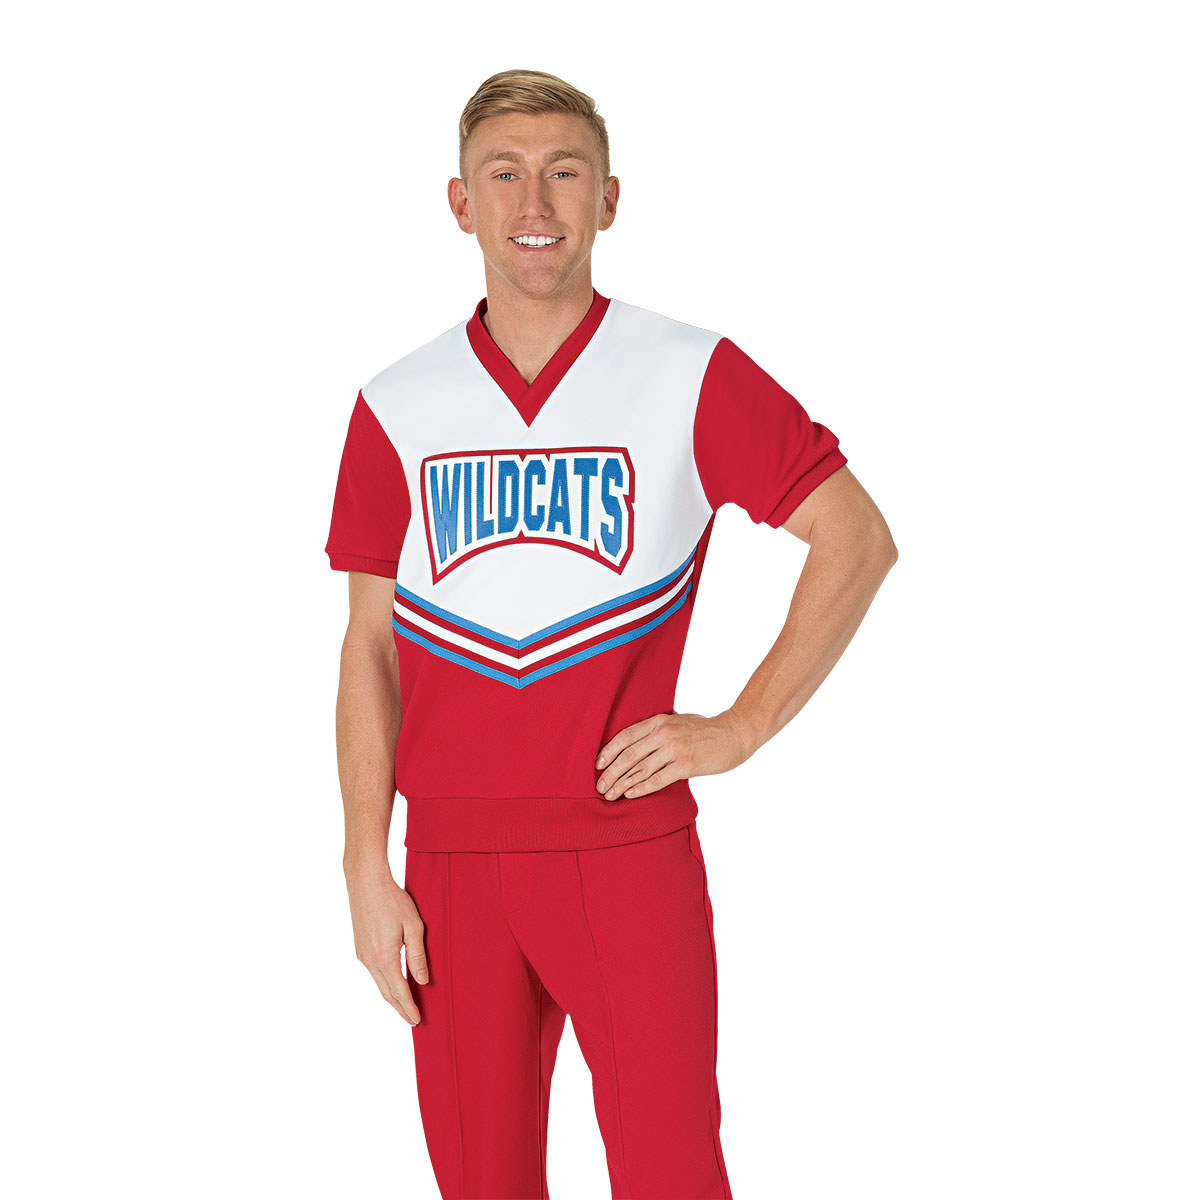 Menu0026#39;s Cheerleading Uniforms